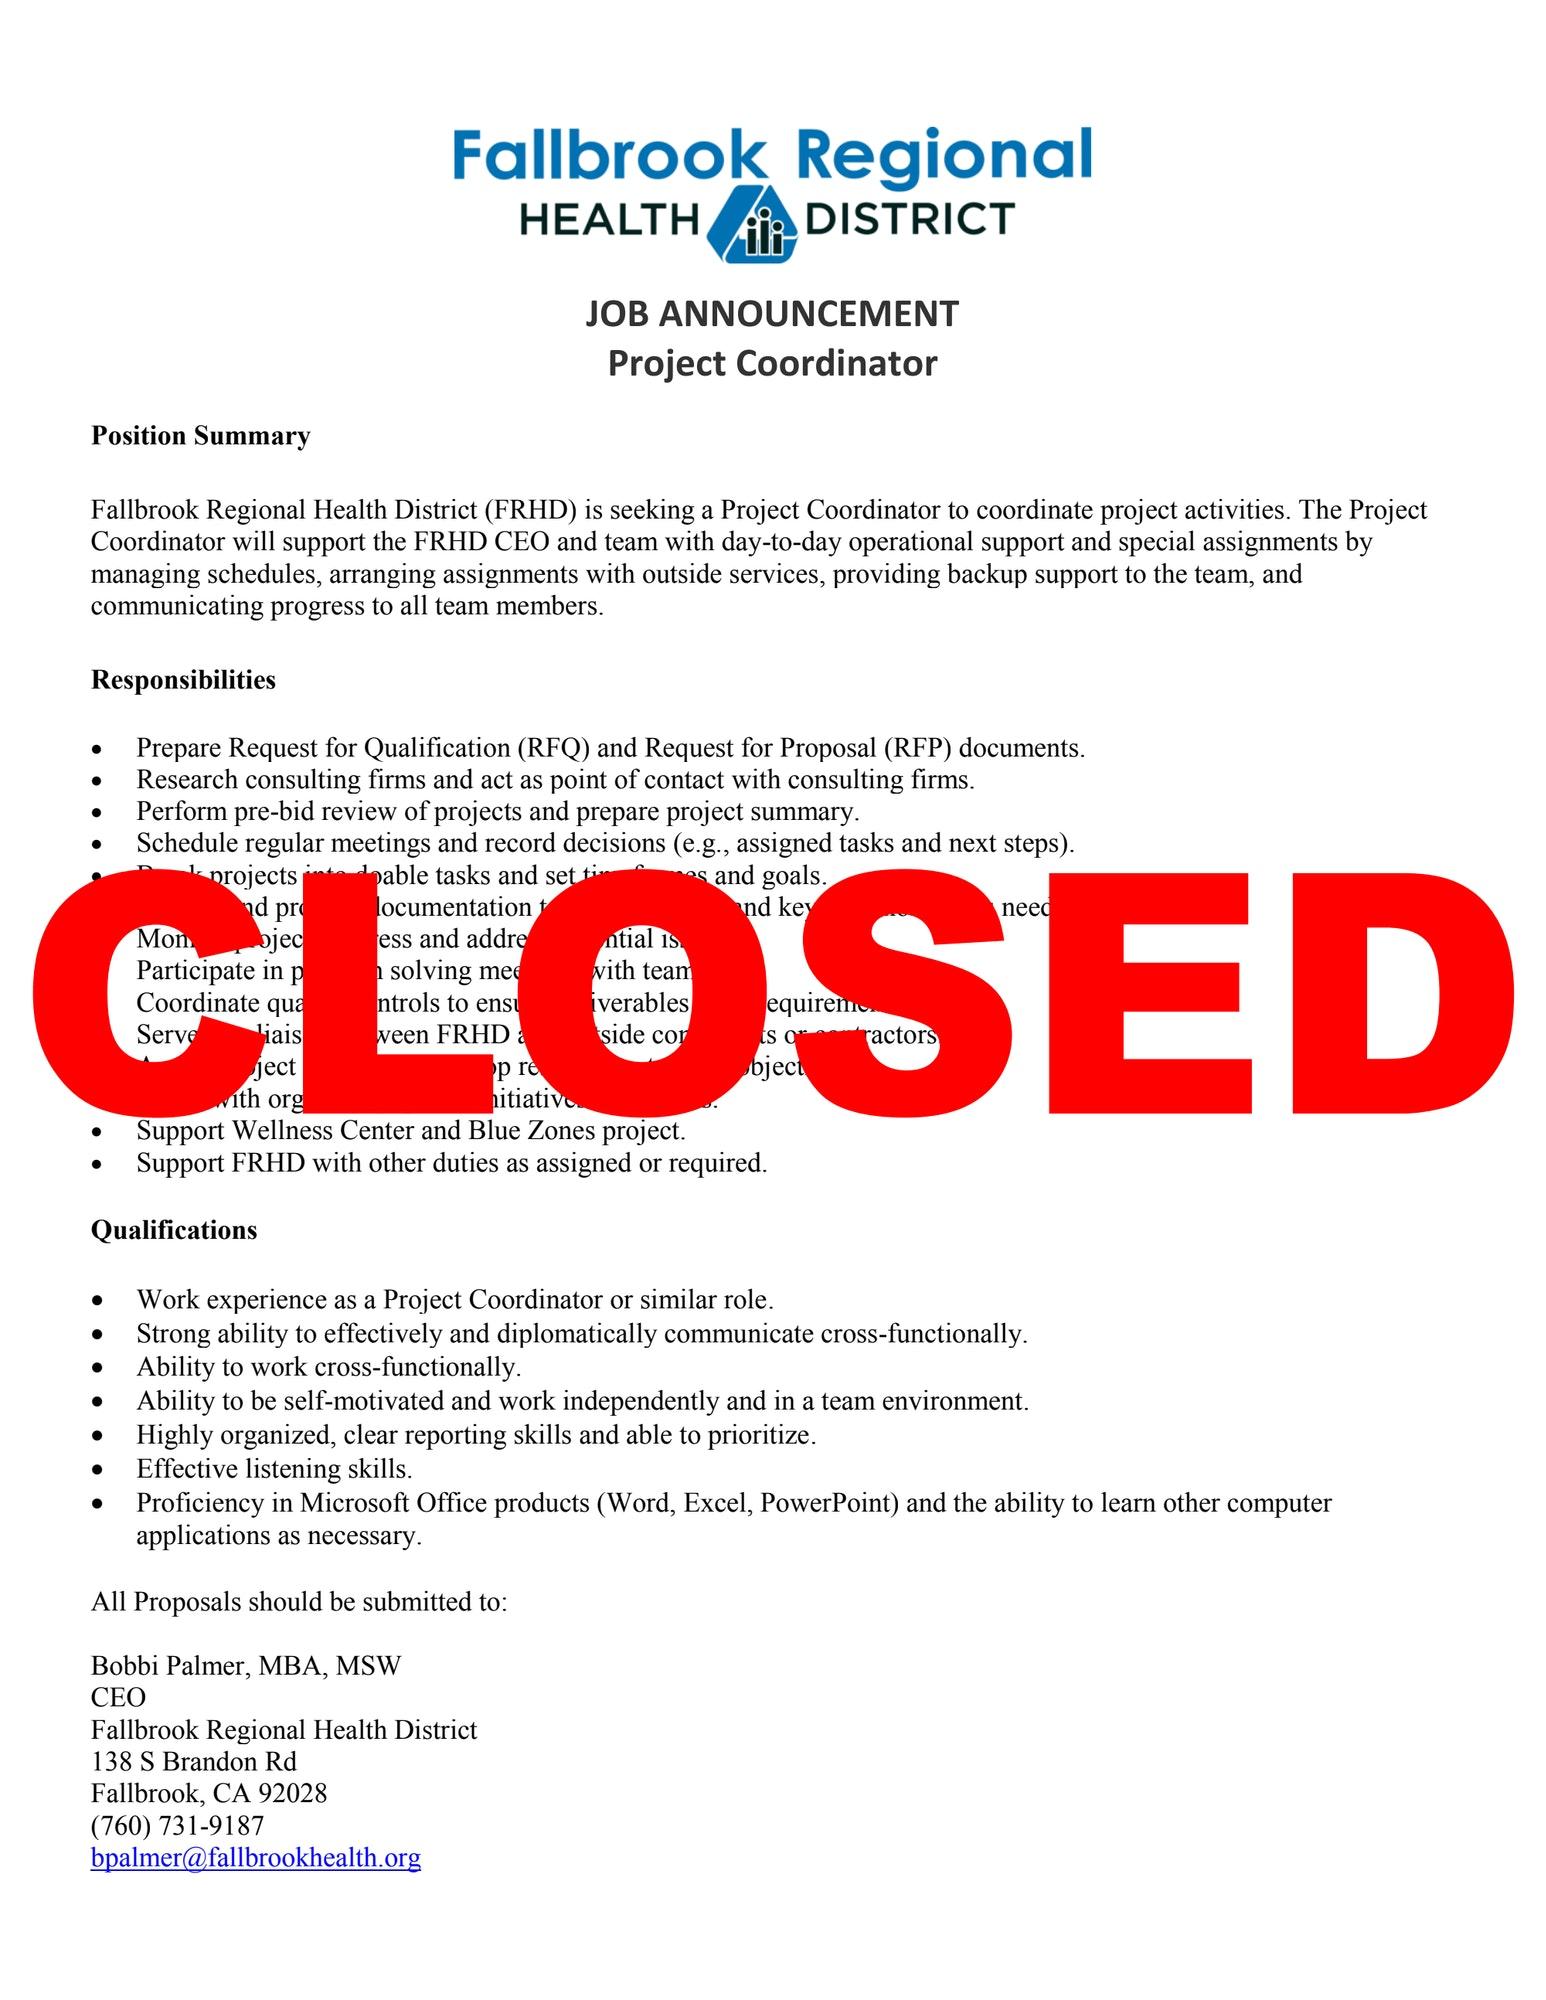 job announcement closed for project coordinator fallbrook regional